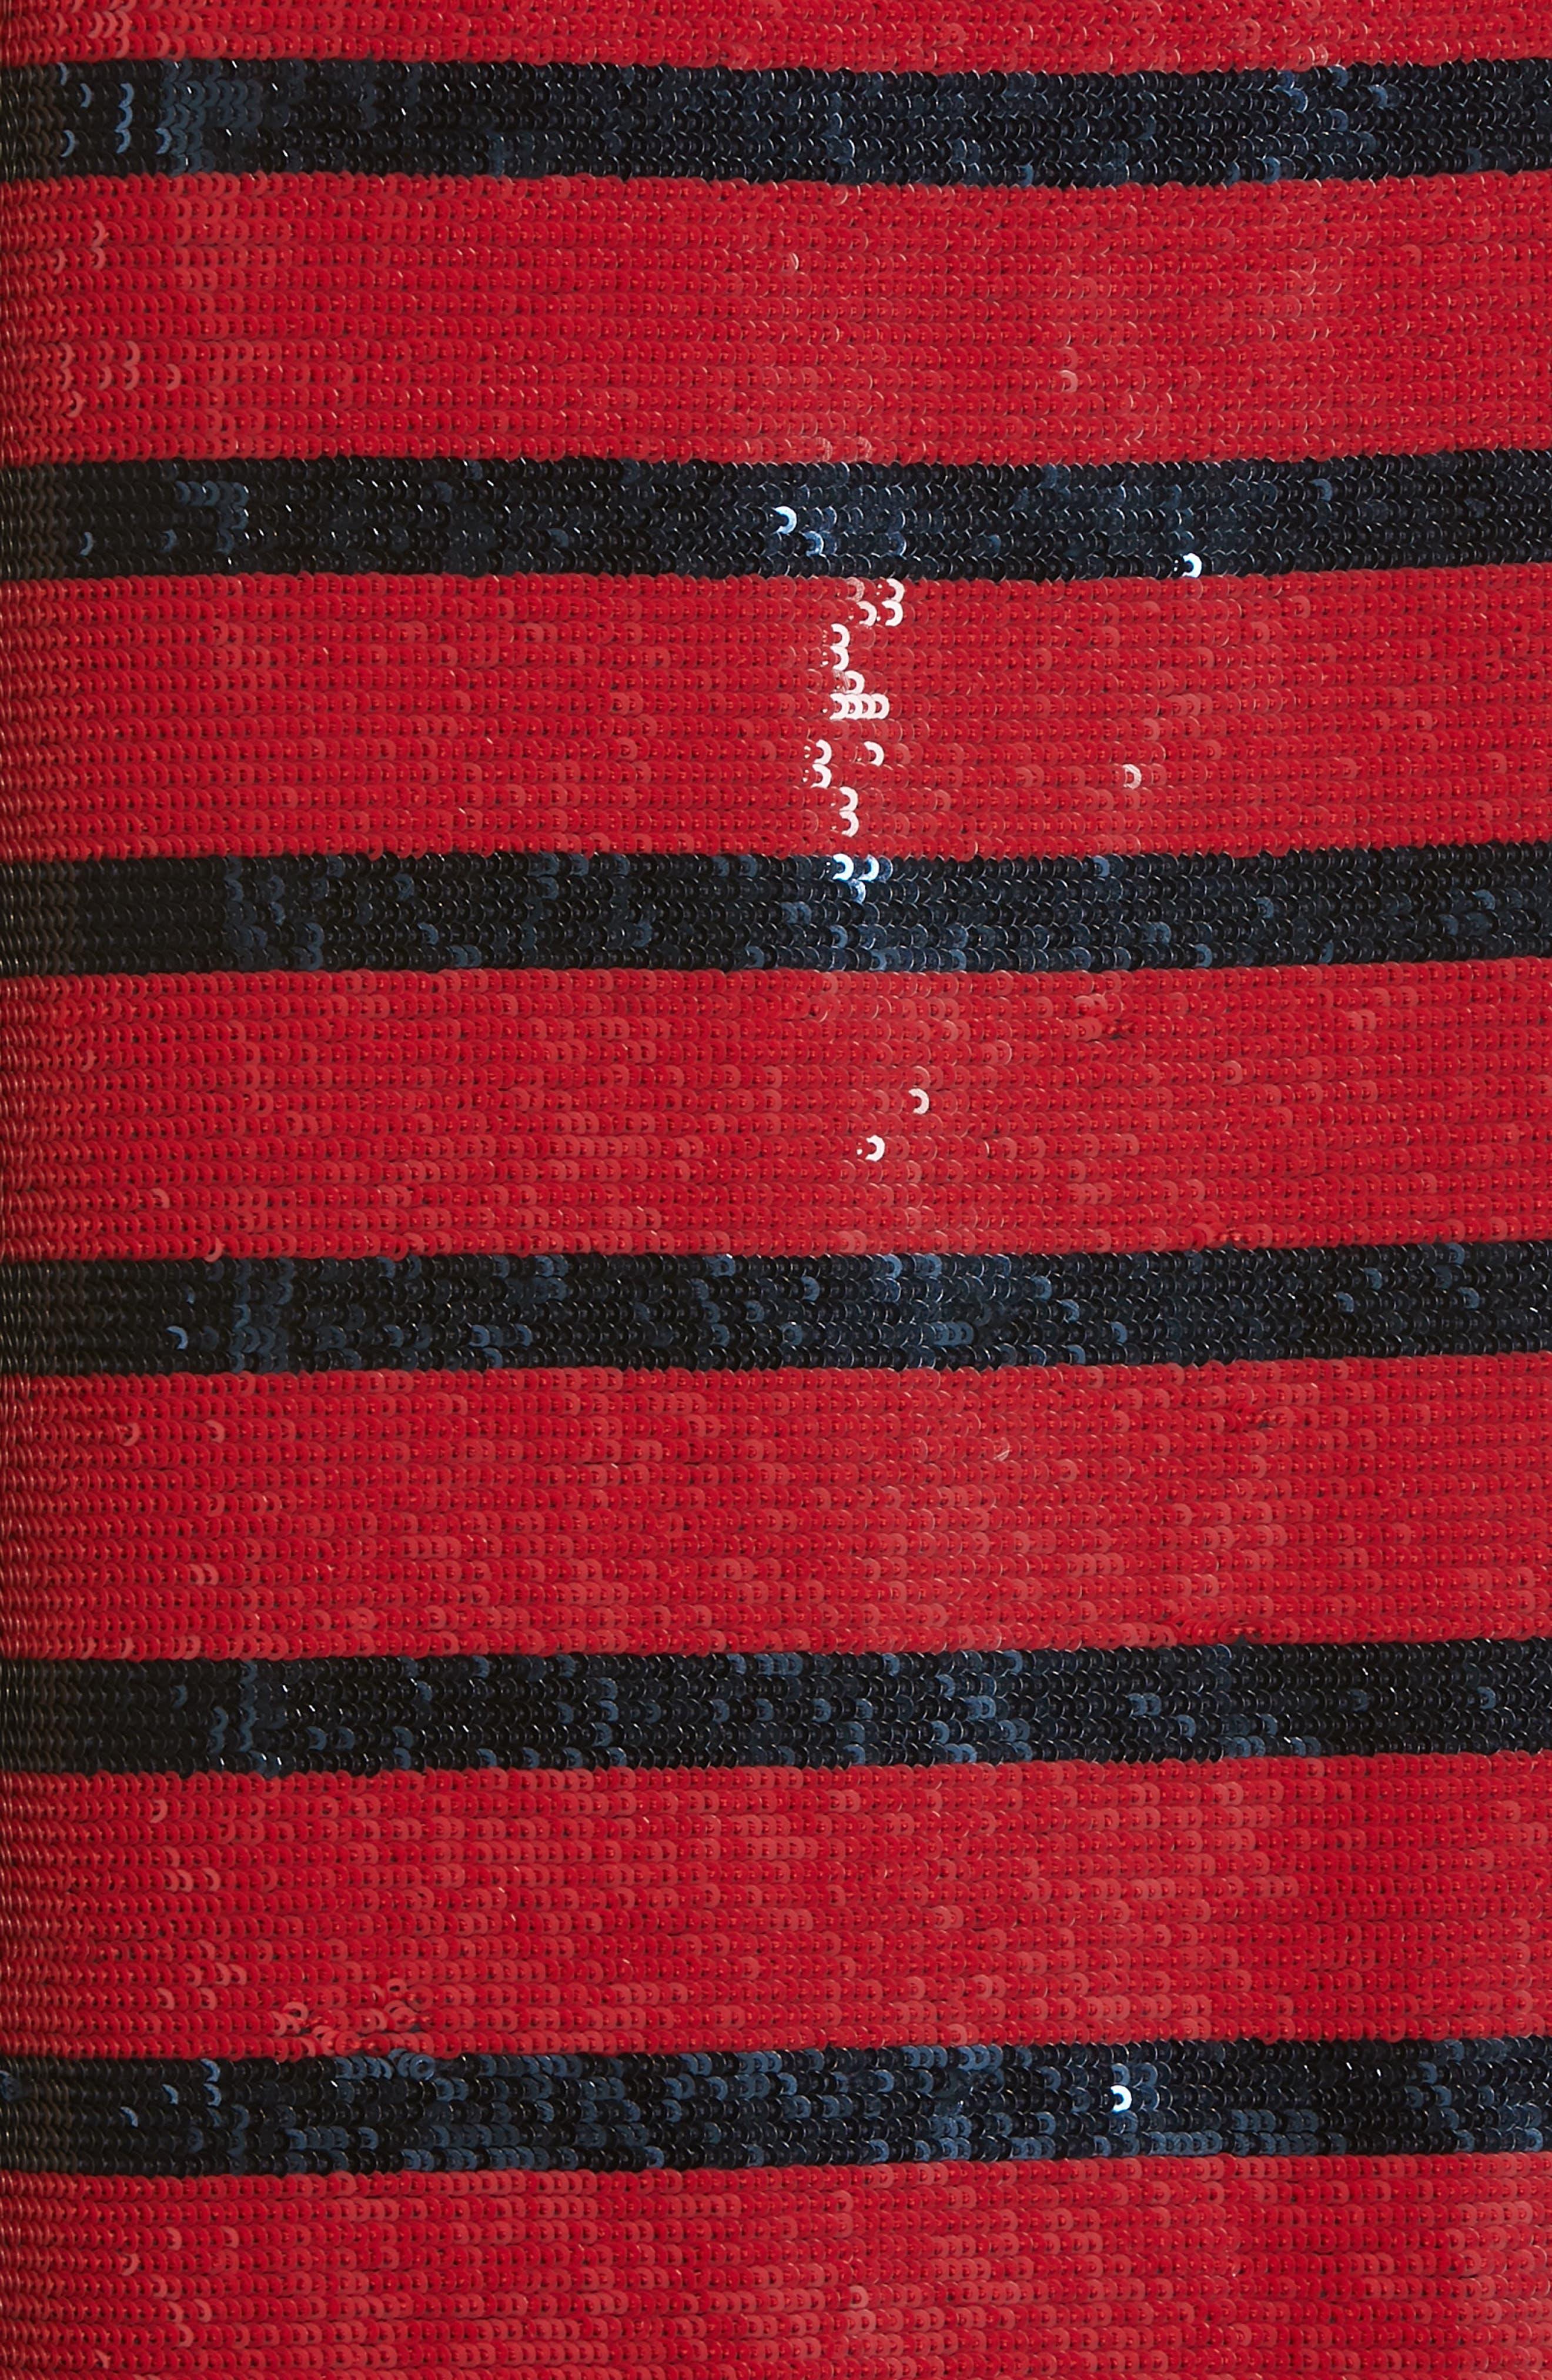 Stripe Sequin Tank Top,                             Alternate thumbnail 5, color,                             RED/ NAVY STRIPE